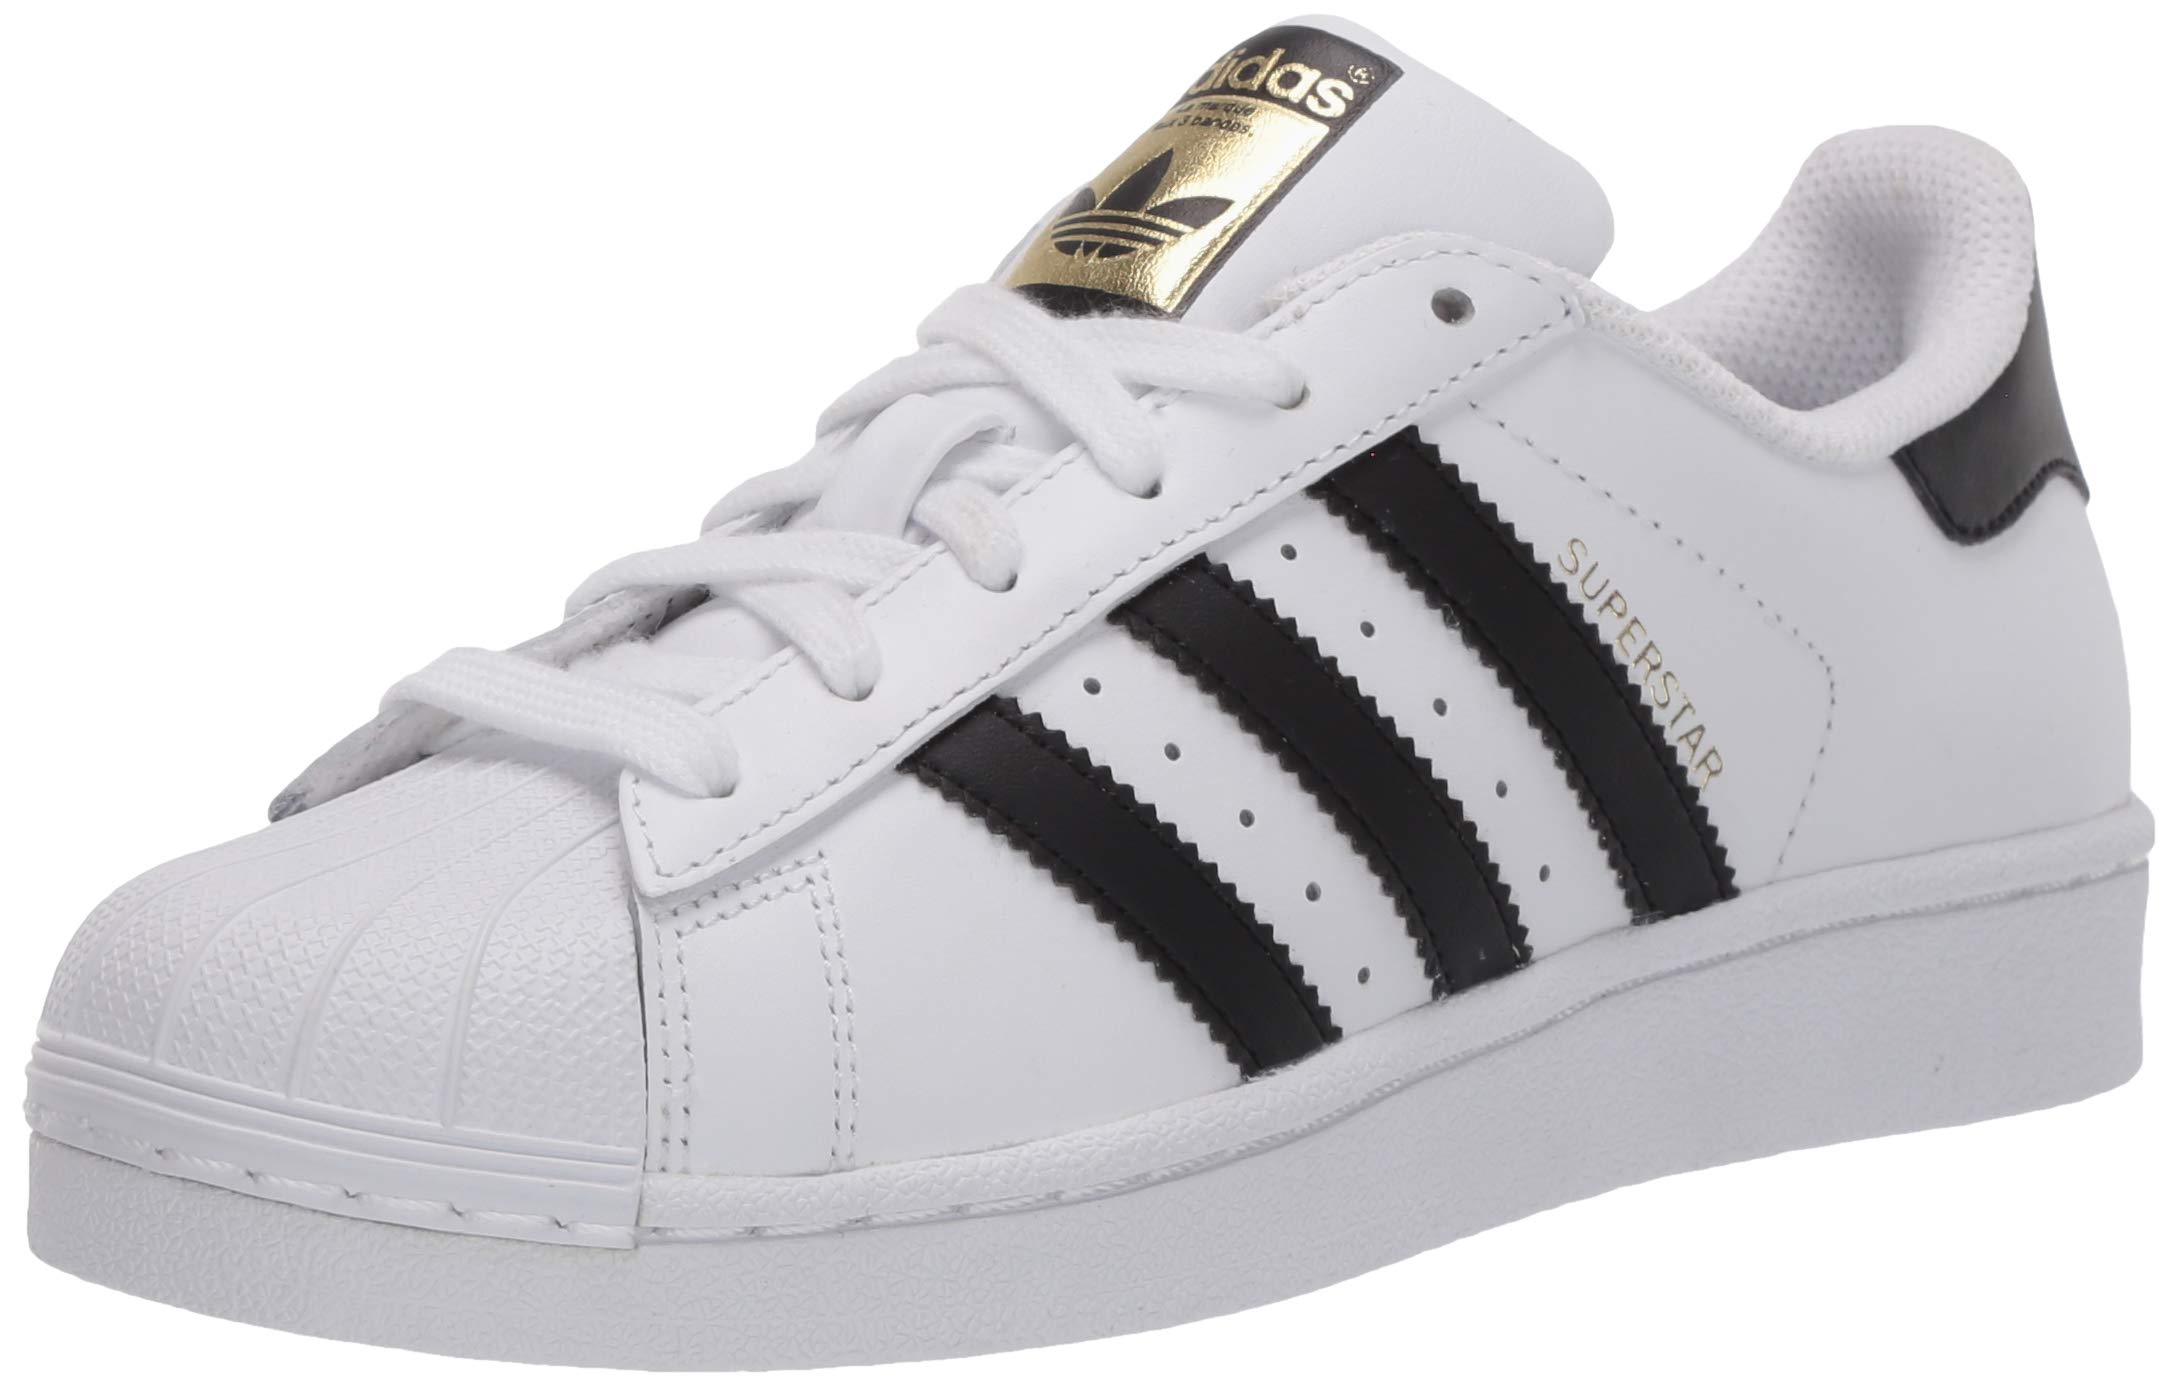 adidas 阿迪达斯 Originals Superstar 中性 儿童运动鞋 Weiß (Ftwr White/Core Black/Ftwr White) 36 2/3 EU